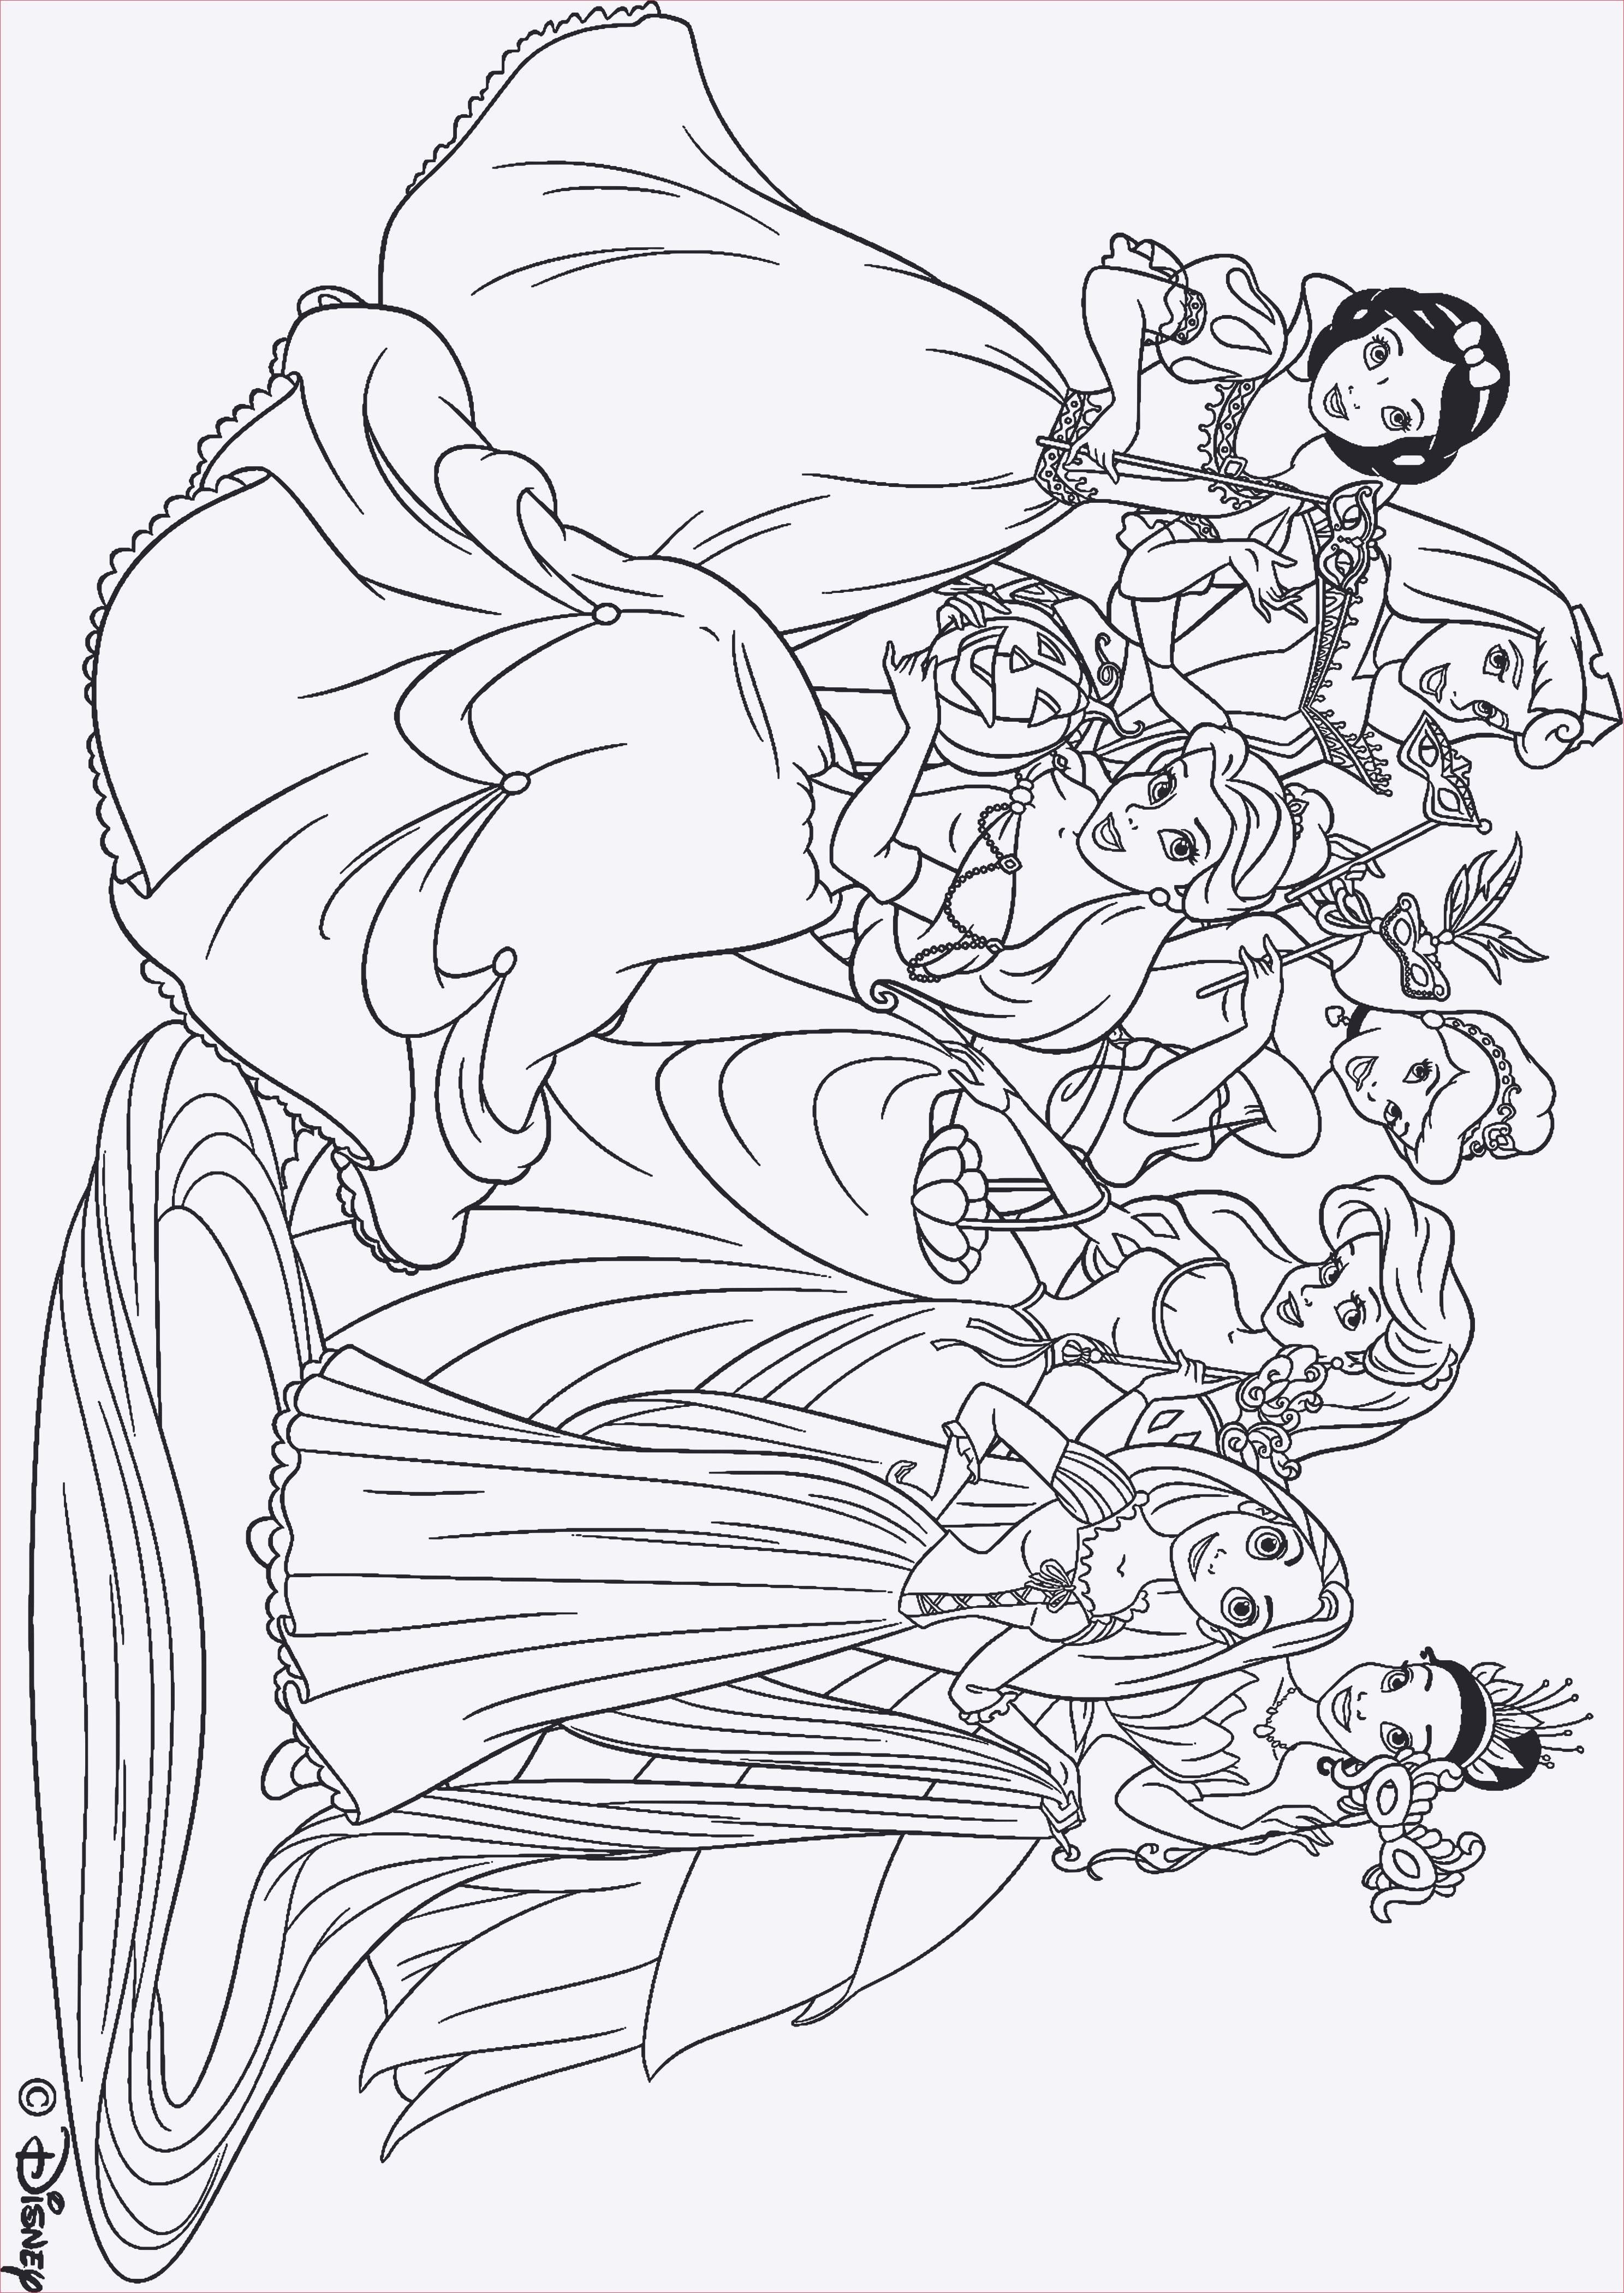 Ausmalbilder Disney Das Beste Von Ausmalbilder Arielle Coloriage Princesse Arielle Beautiful Coloriage Galerie